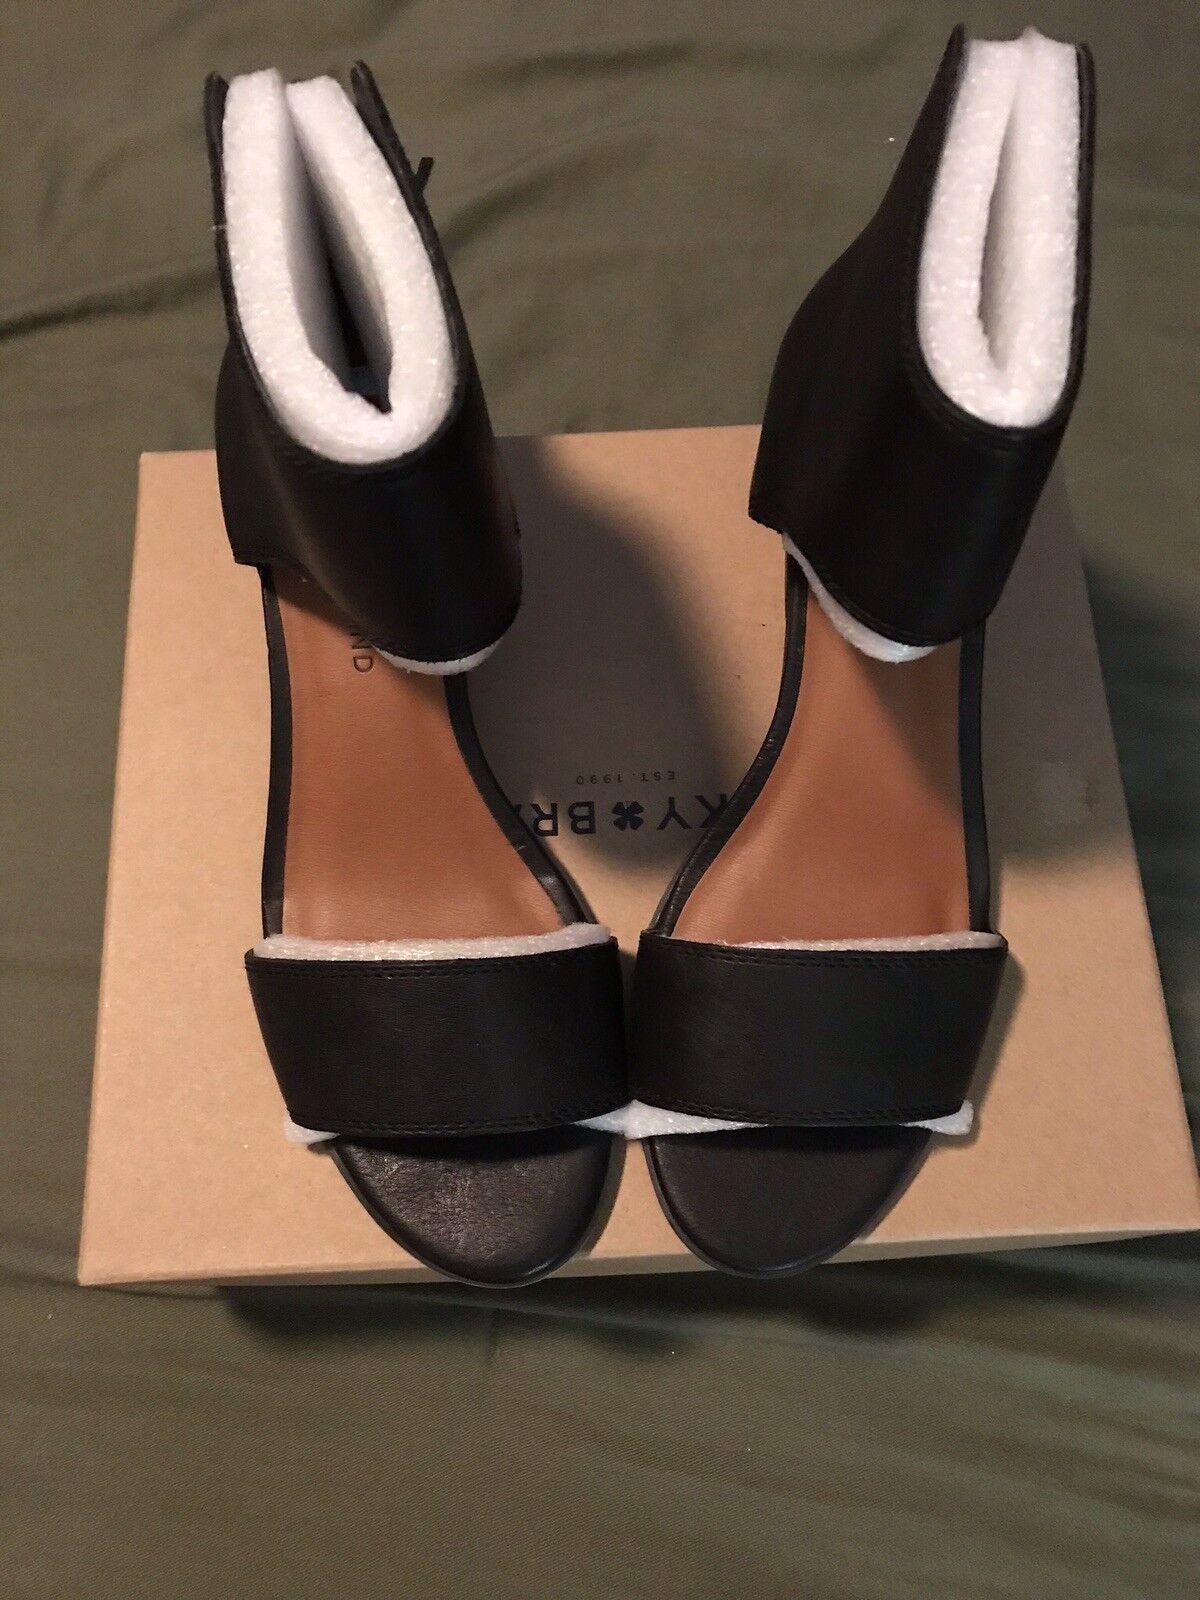 Lucky Brand nero Leather Sandals - Sz Sz Sz 8   38 - New in Box 7097bb